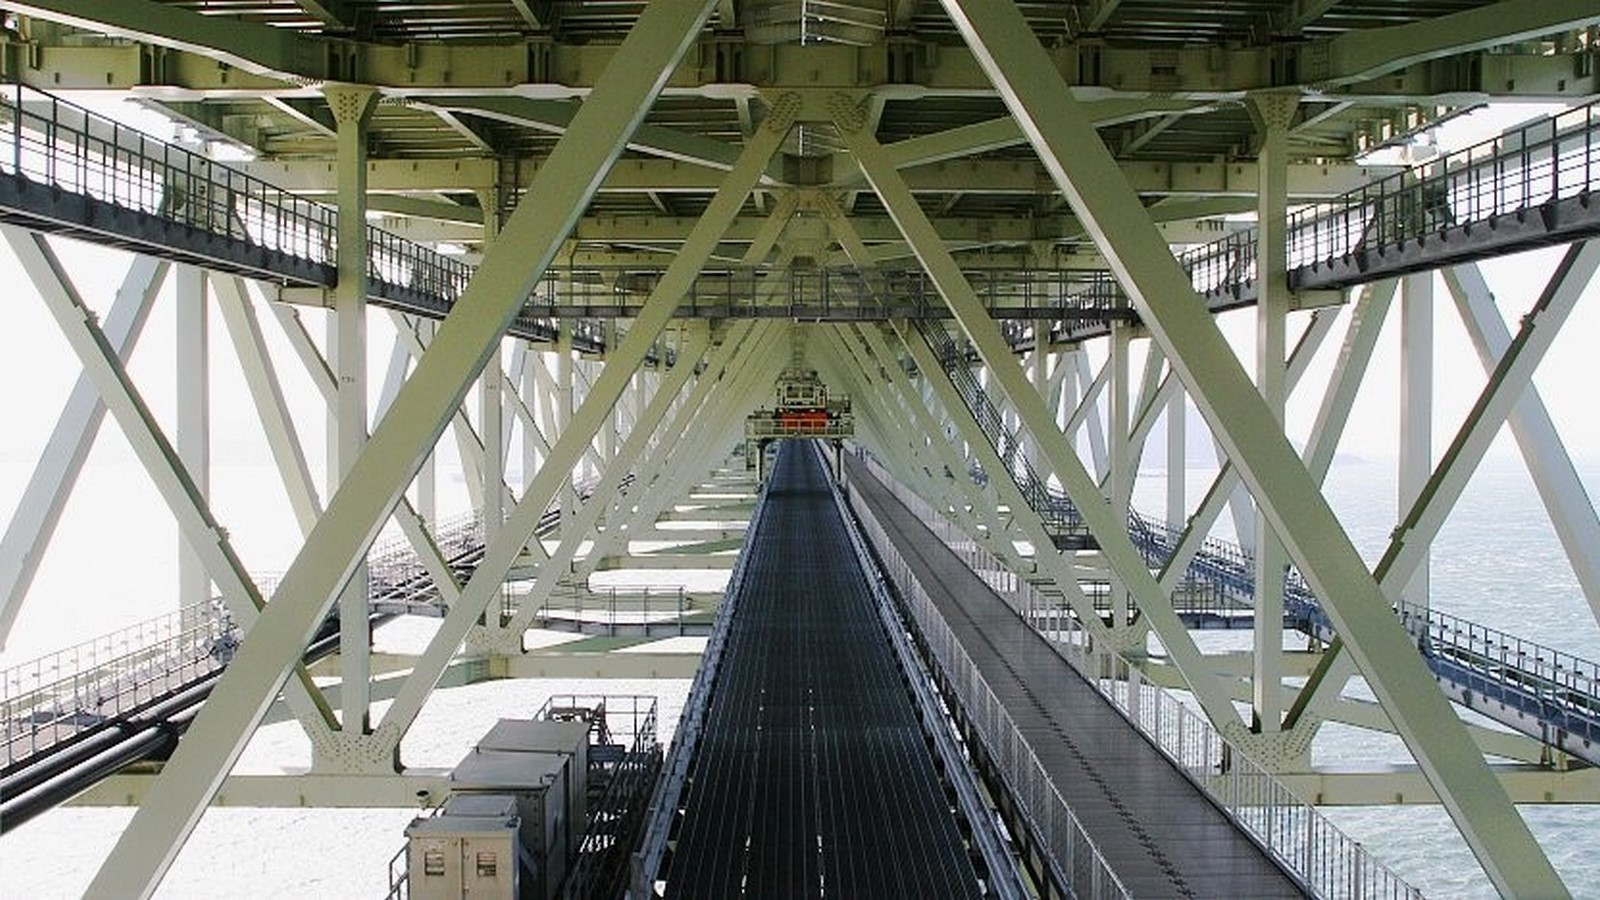 Akashi Kaikyo Bridge, Japan by Satoshi Kashima- The Longest Suspension Bridge in the World - Sheet9